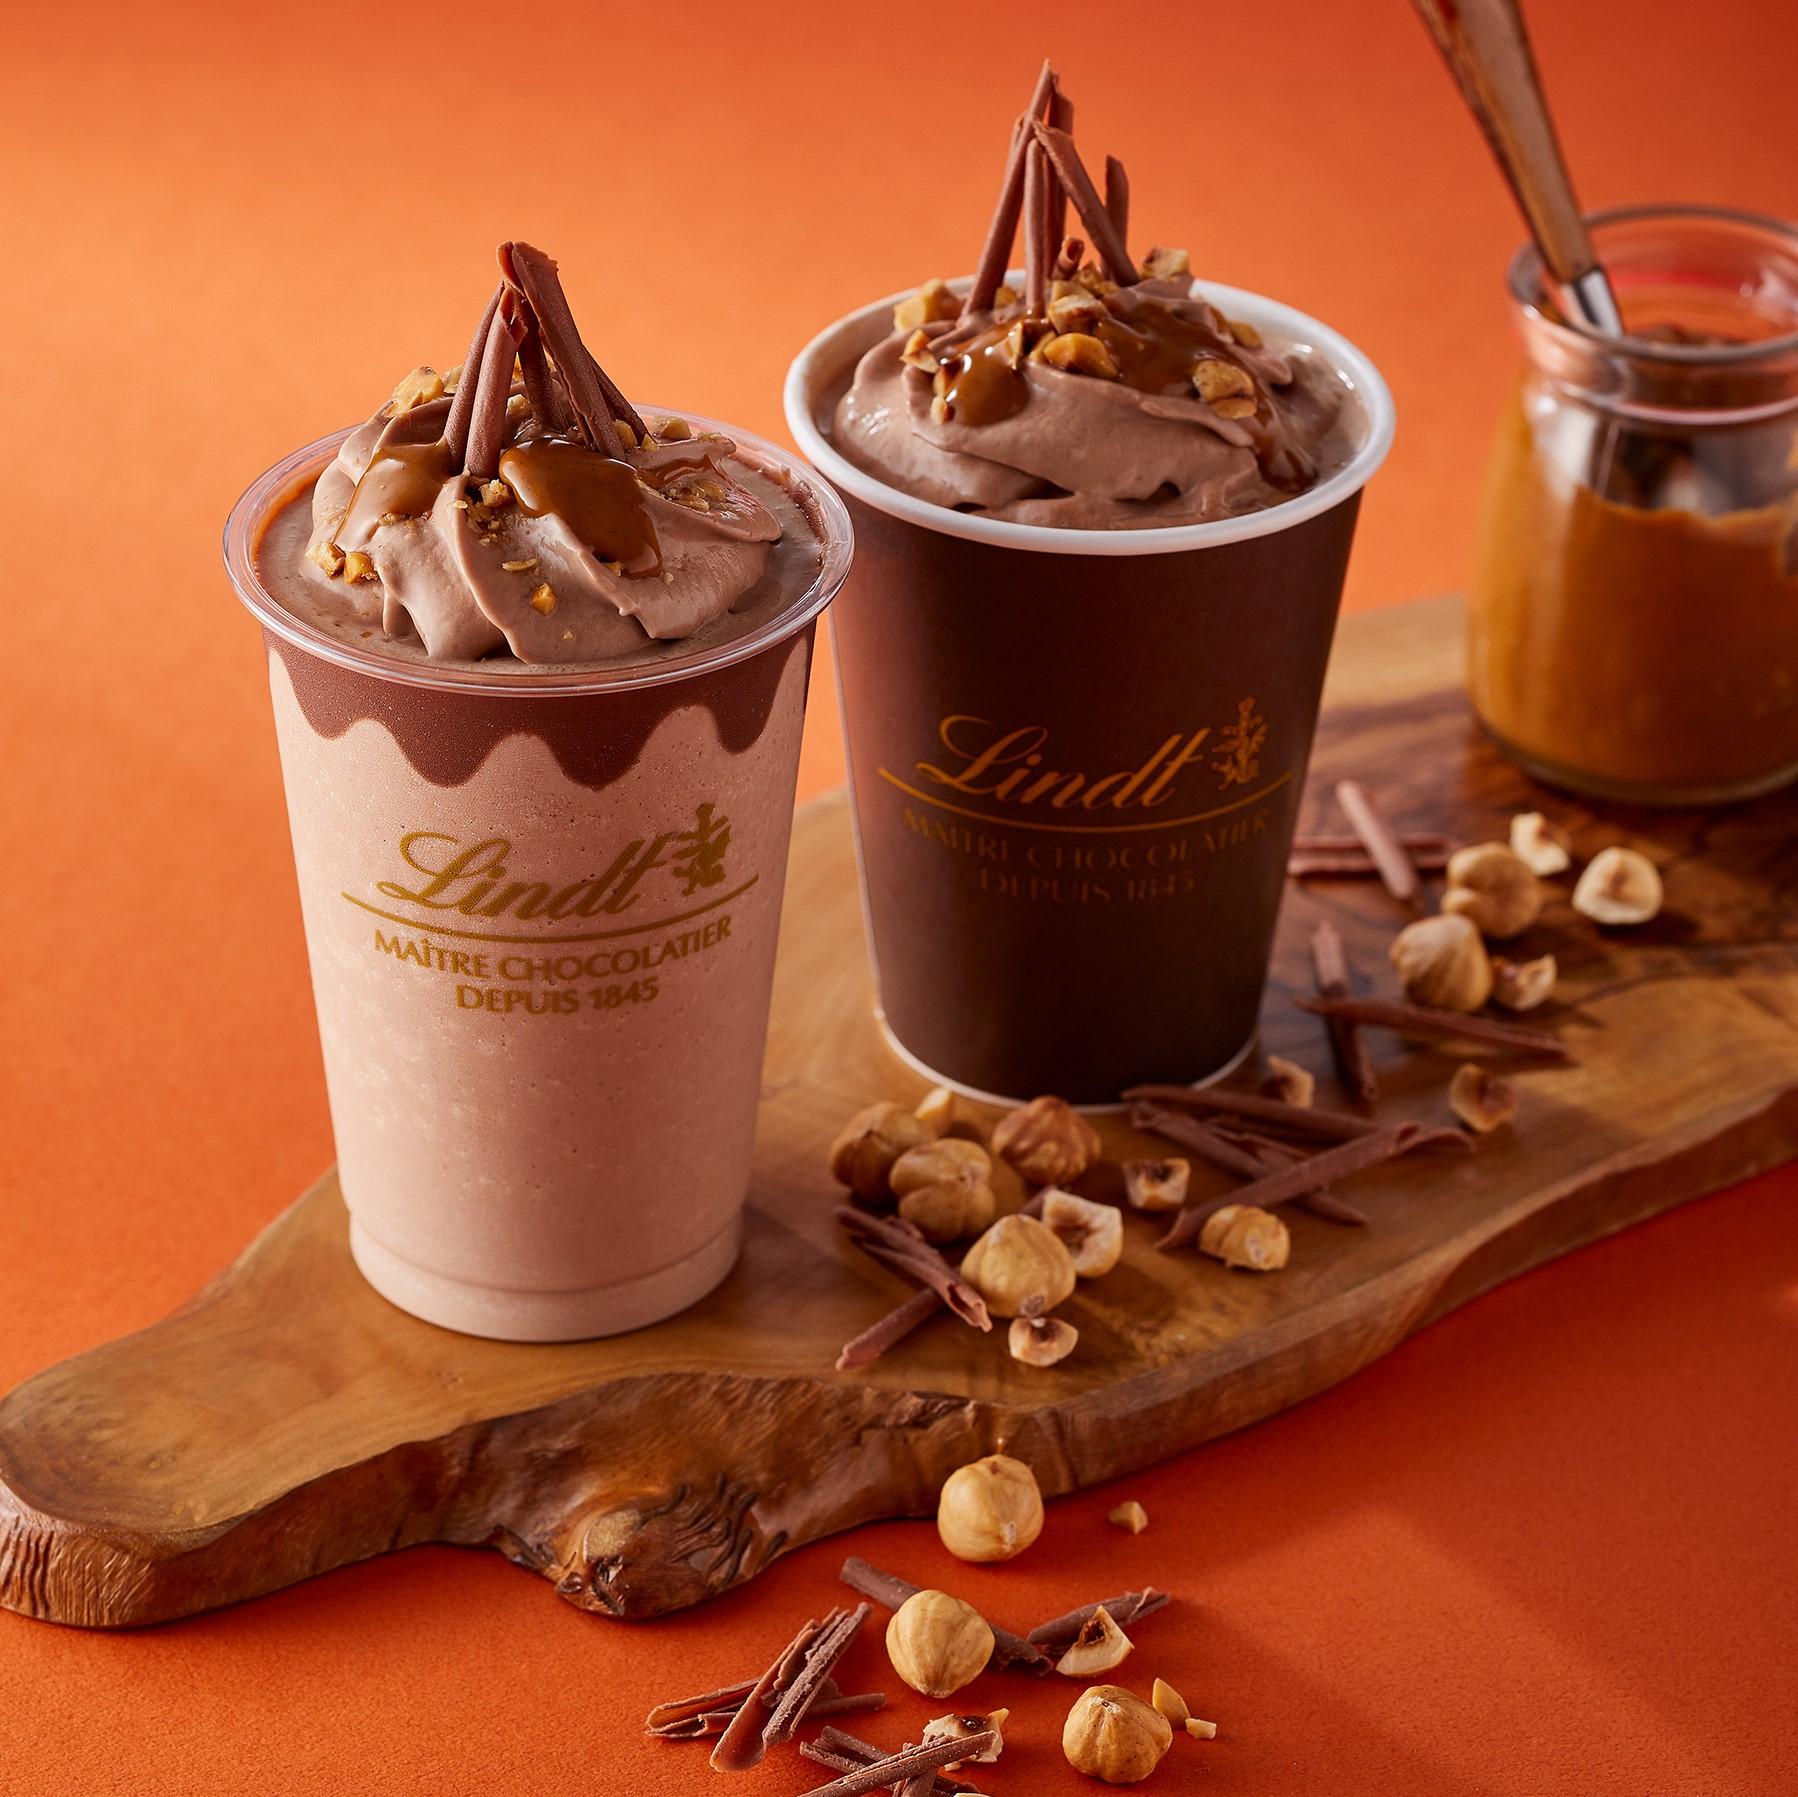 %e3%83%81%e3%83%a7%e3%82%b3%e3%83%ac%e3%83%bc%e3%83%88%e3%83%89%e3%83%aa%e3%83%b3%e3%82%af-lindt-chocolate-drinks